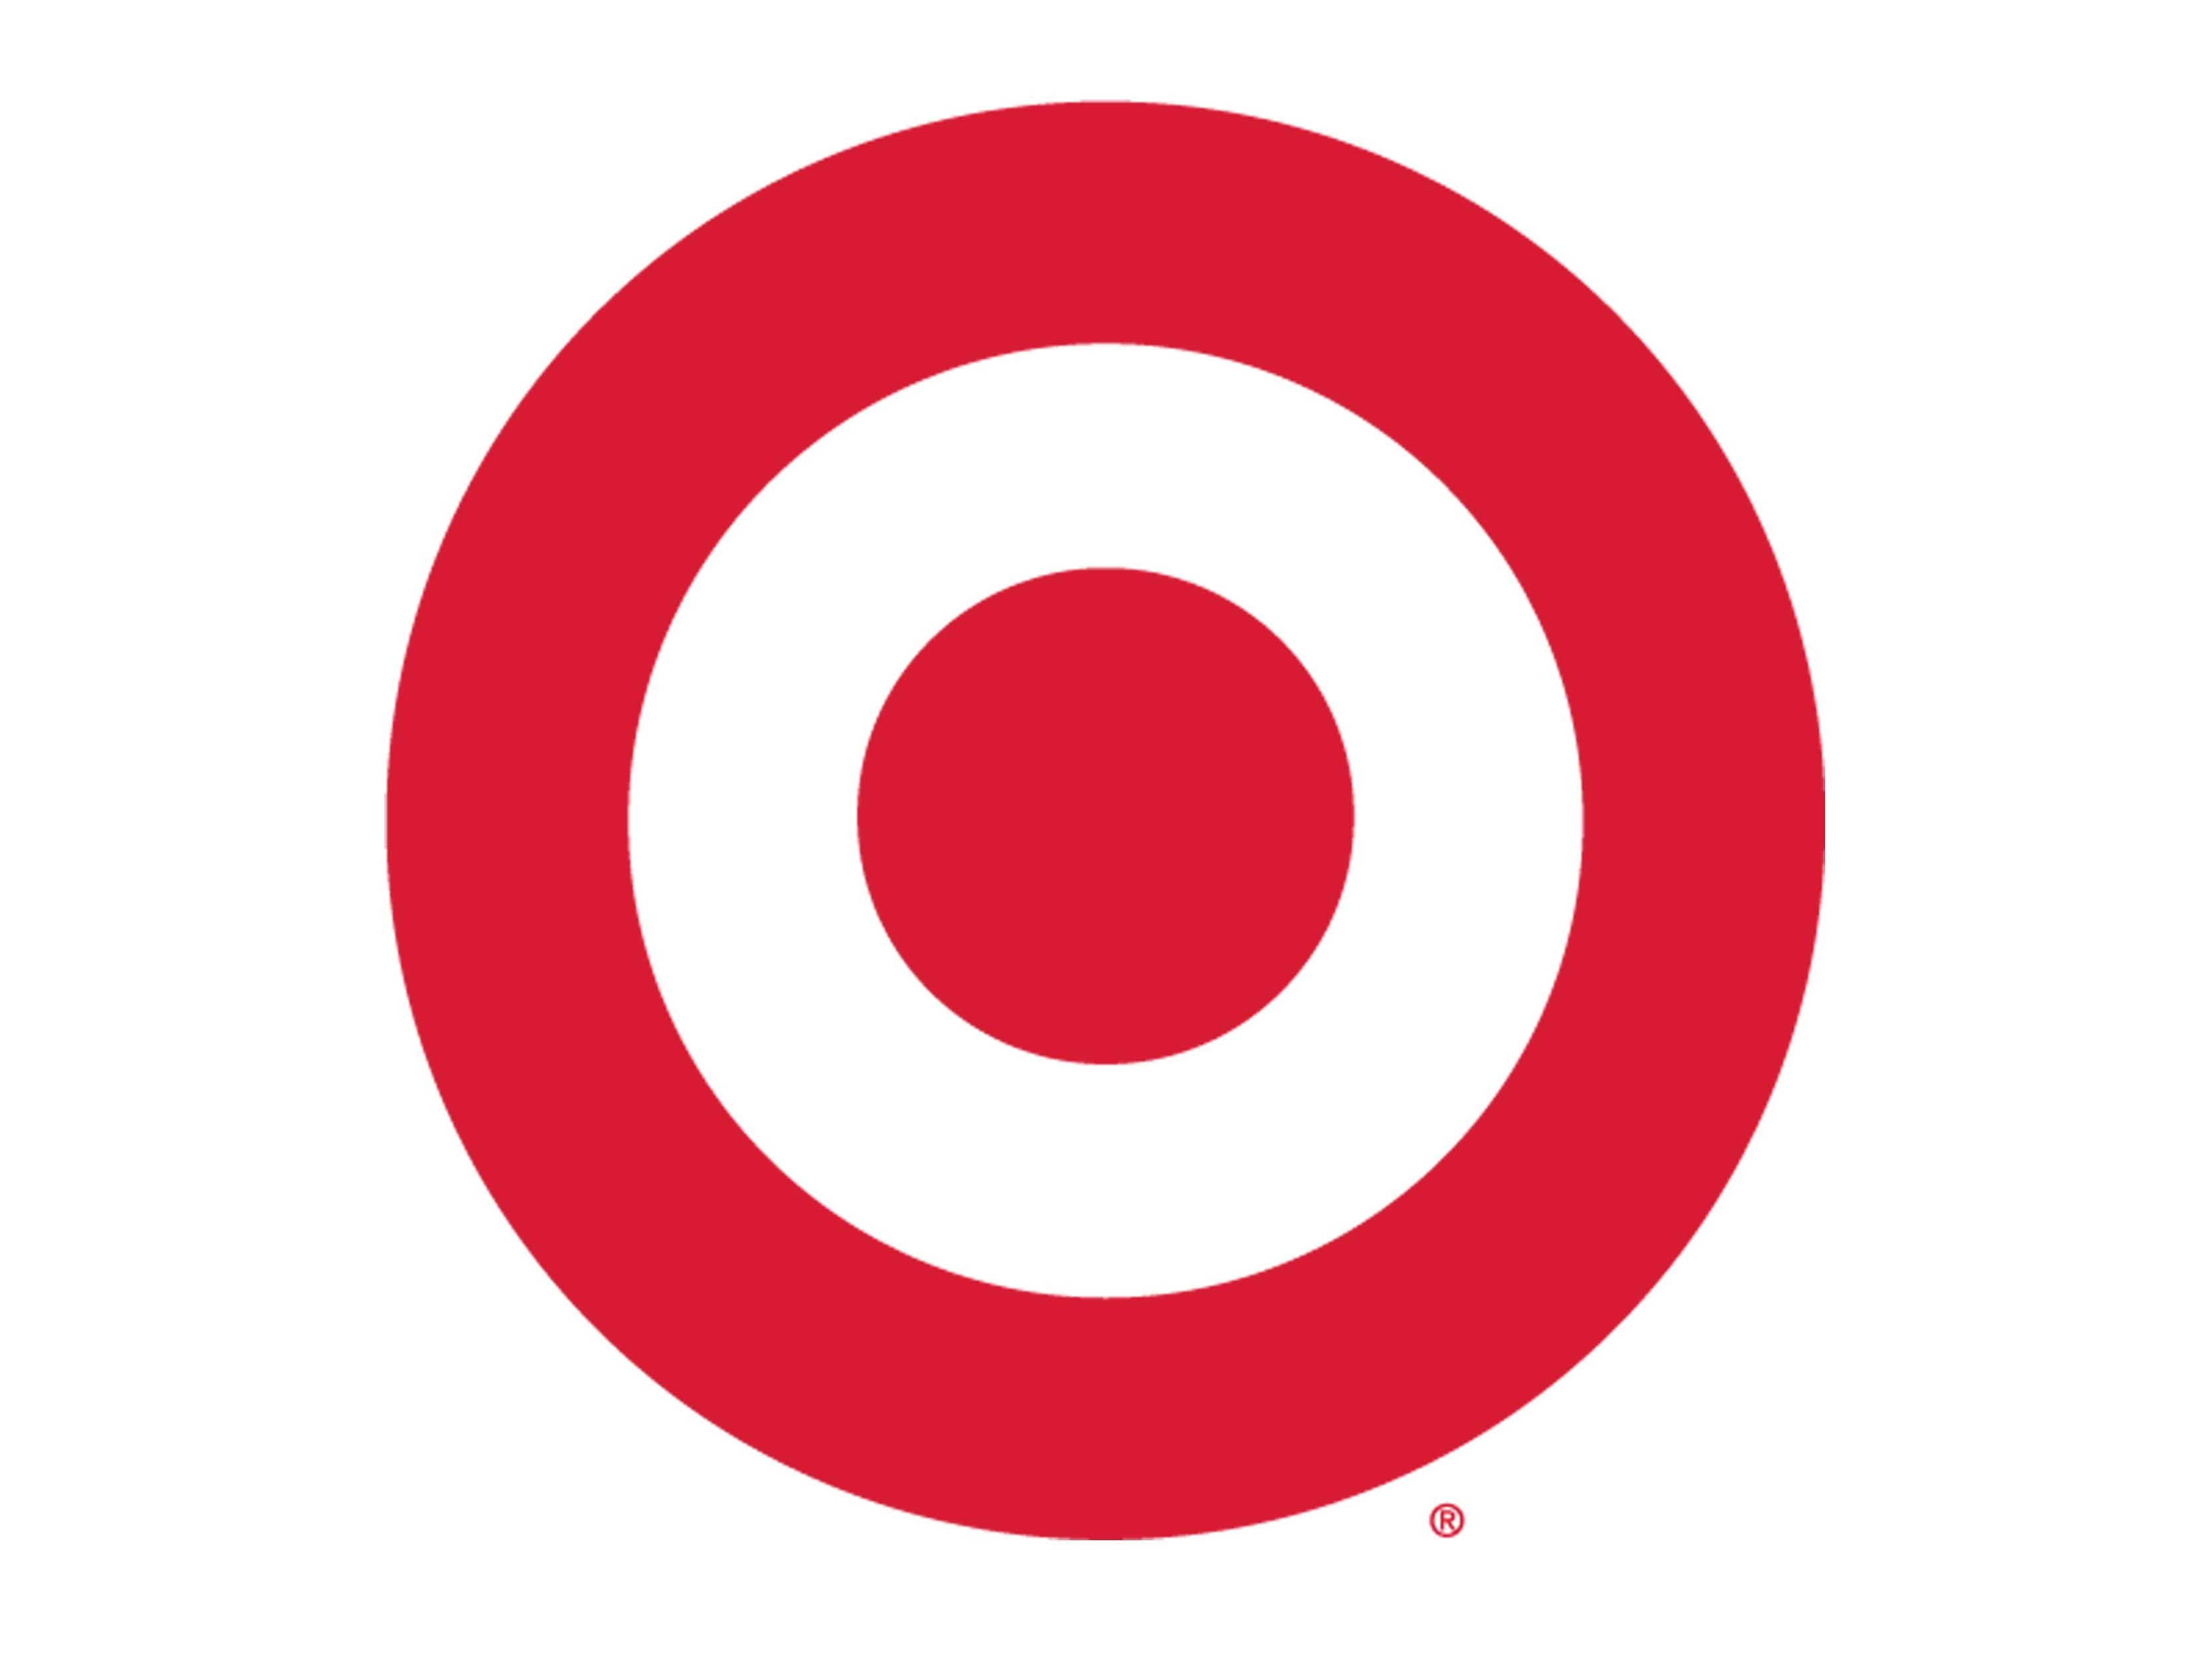 Bullseye clipart logo. With best